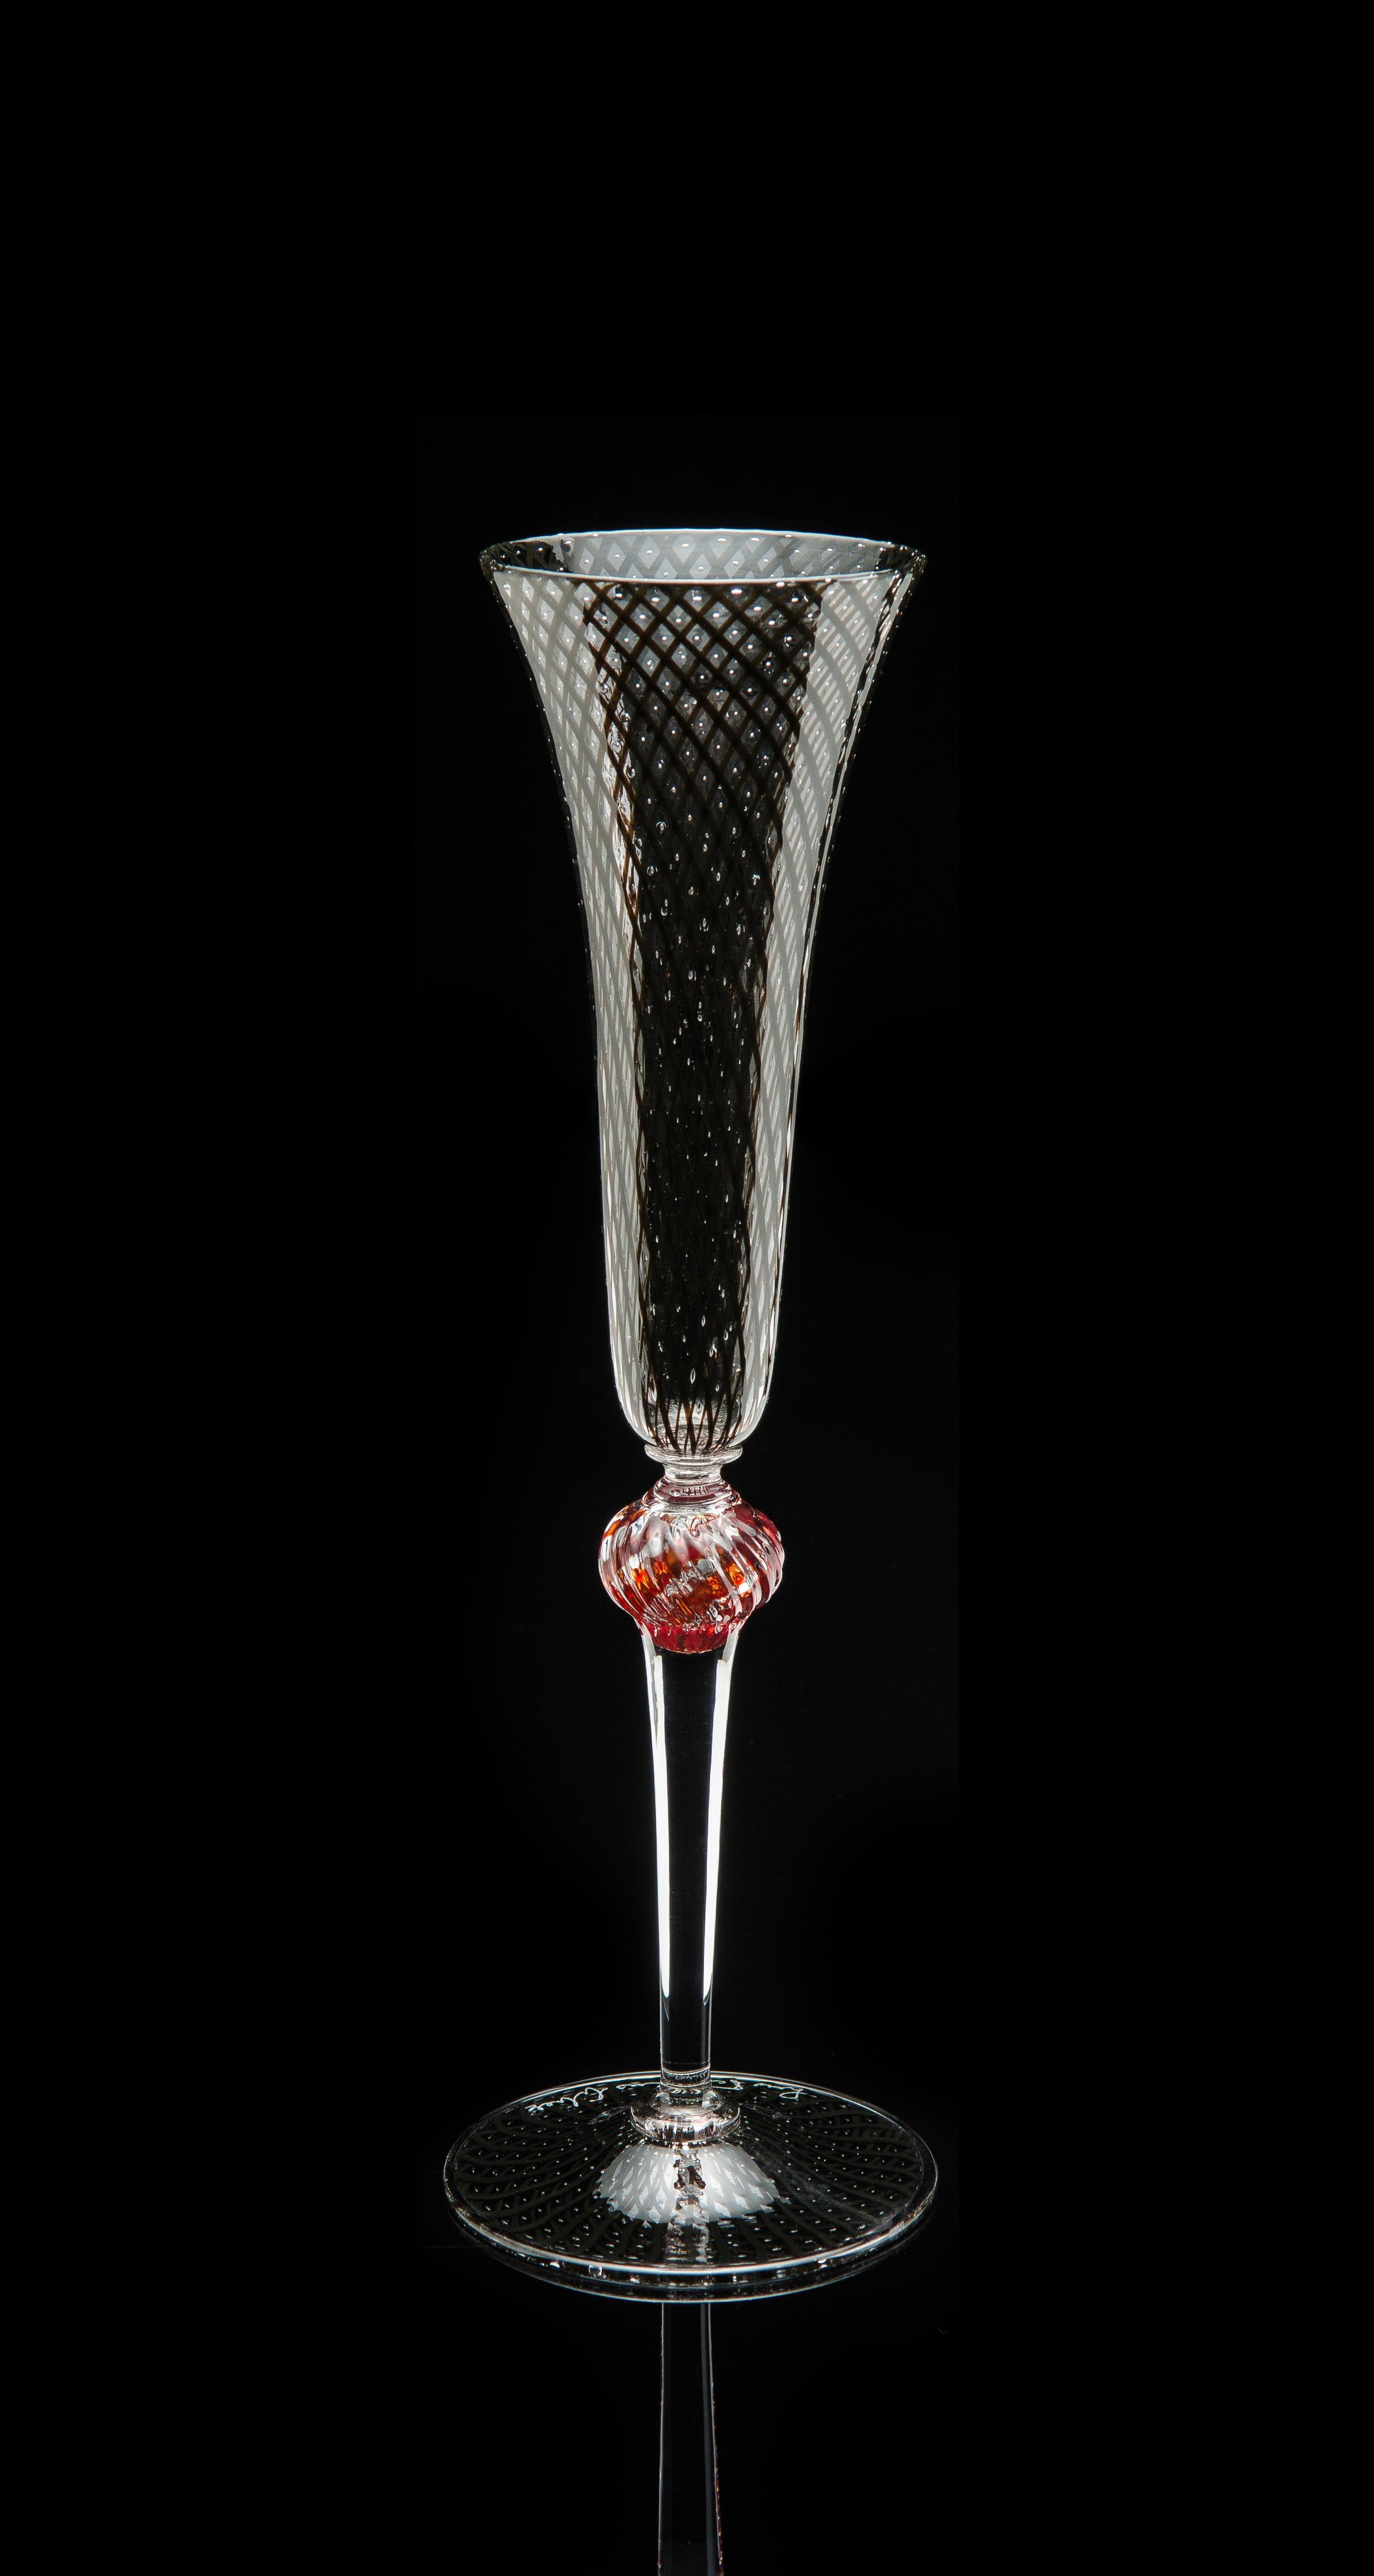 Lino Tagliapietra, Goblet (1991-1994, glass, 10 1/2 x 3 1/4 x 3 1/4 inches), LT.82